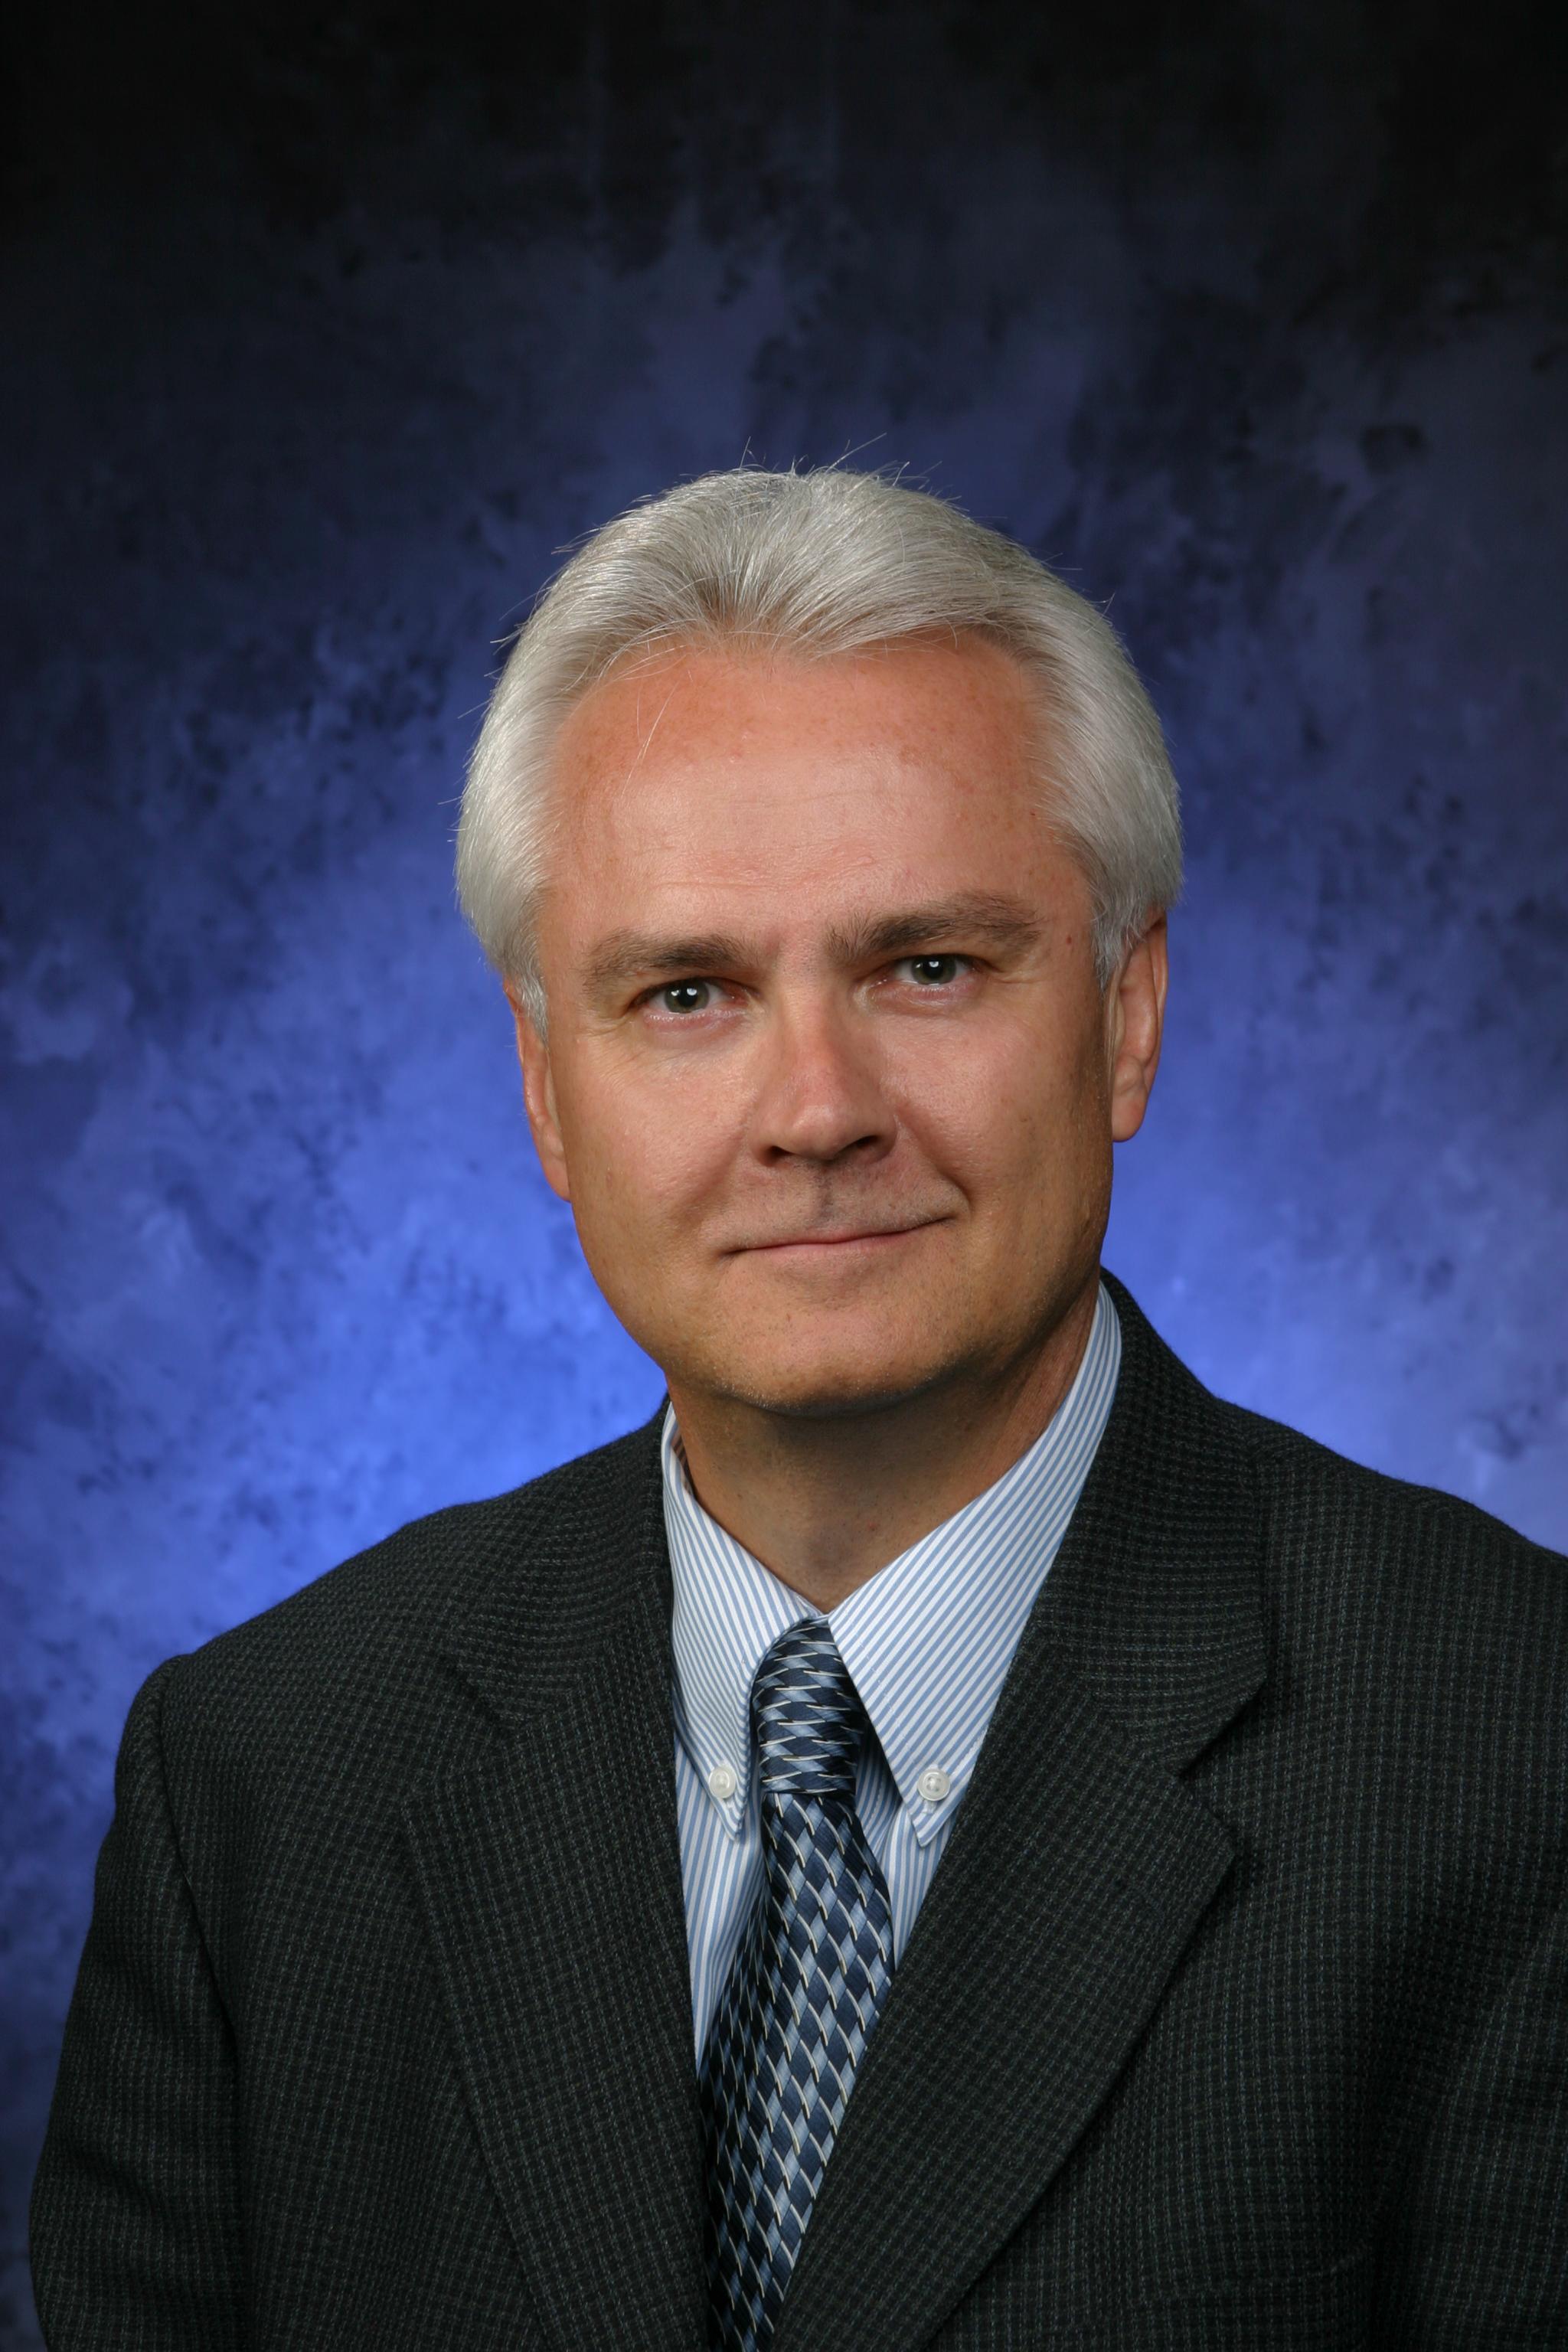 Dr. James Connor